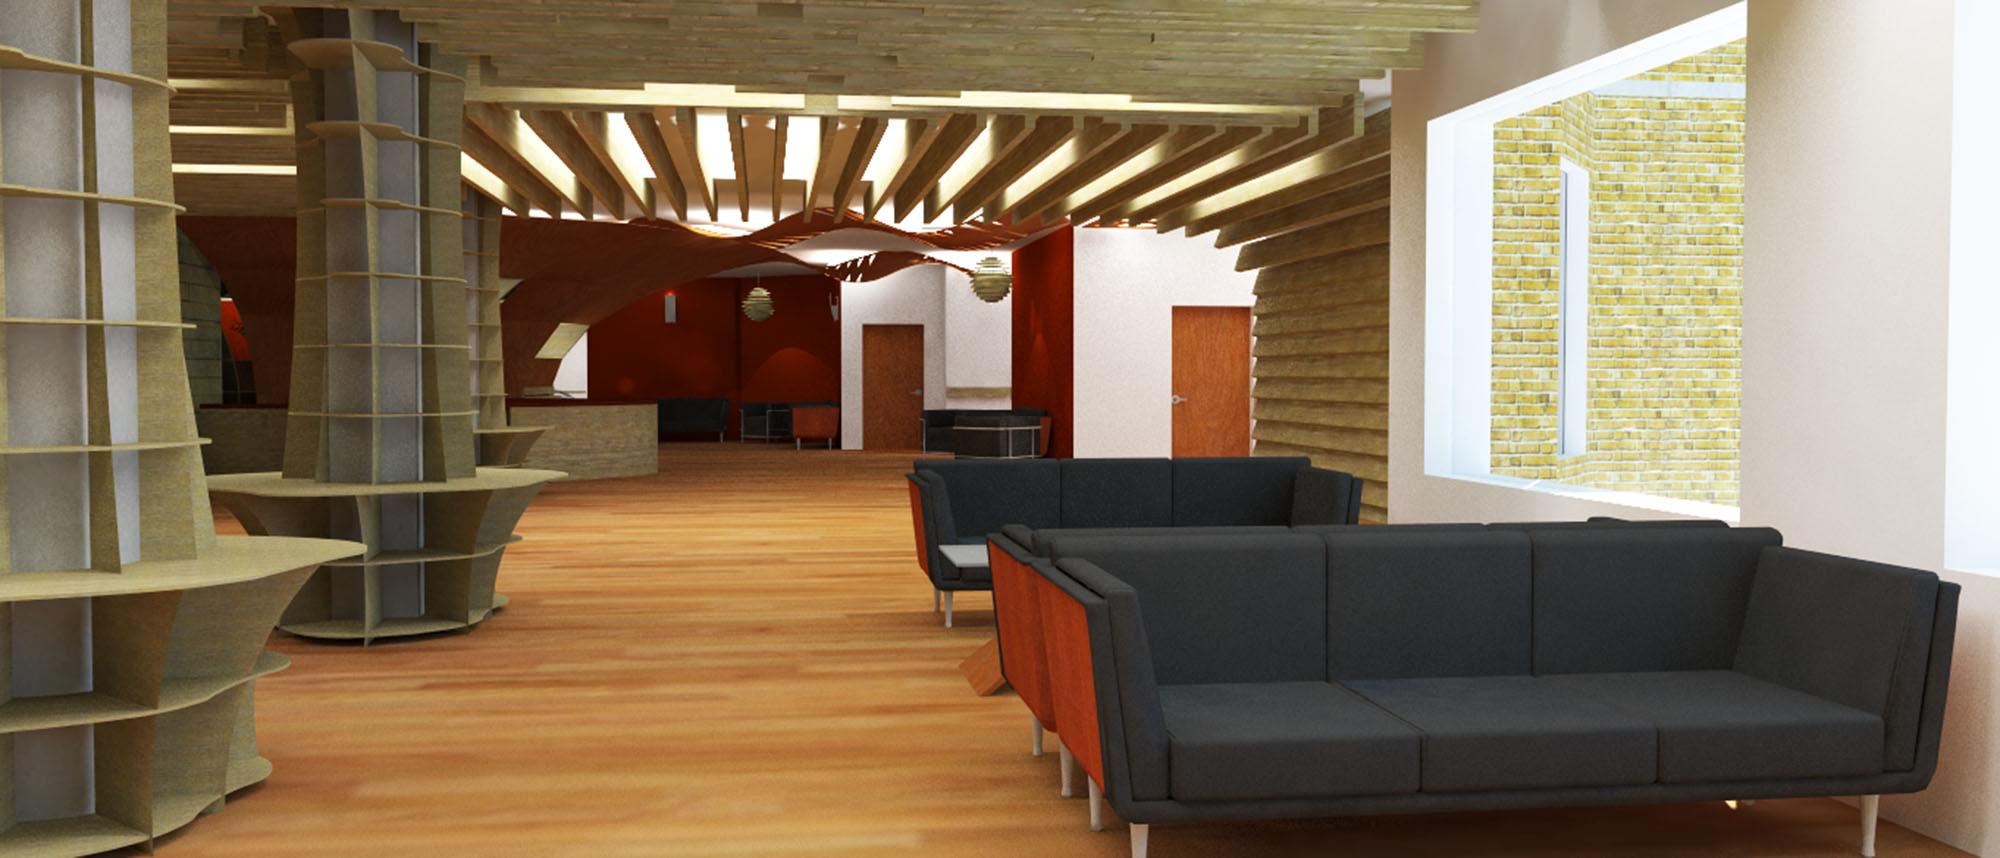 Wall-To-Ceiling_Lobby-Entrance.jpg